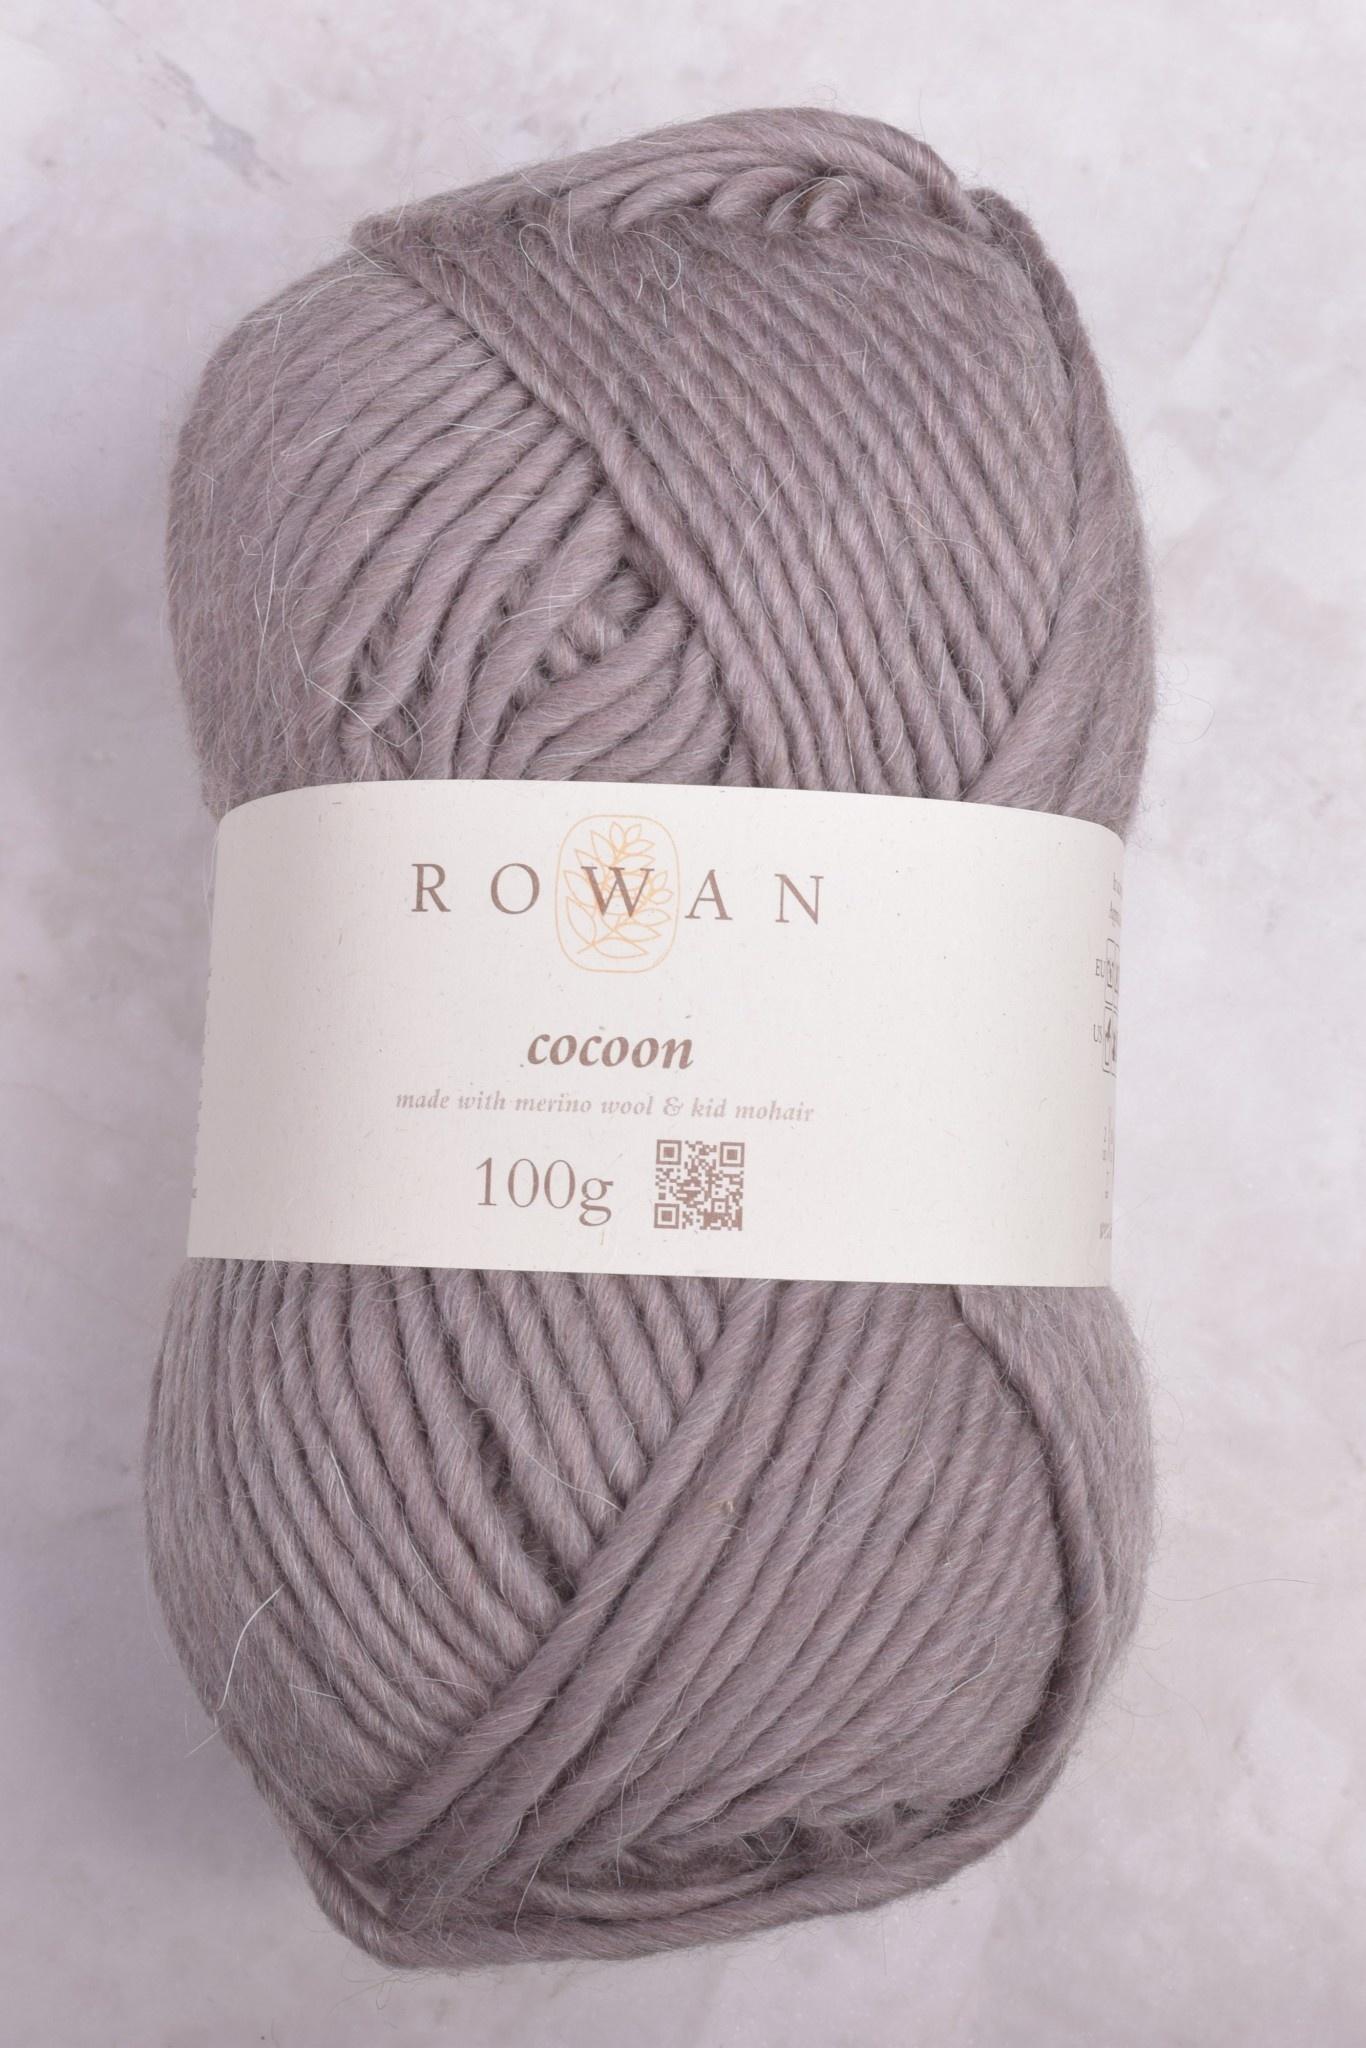 Image of Rowan Cocoon 849 Dove